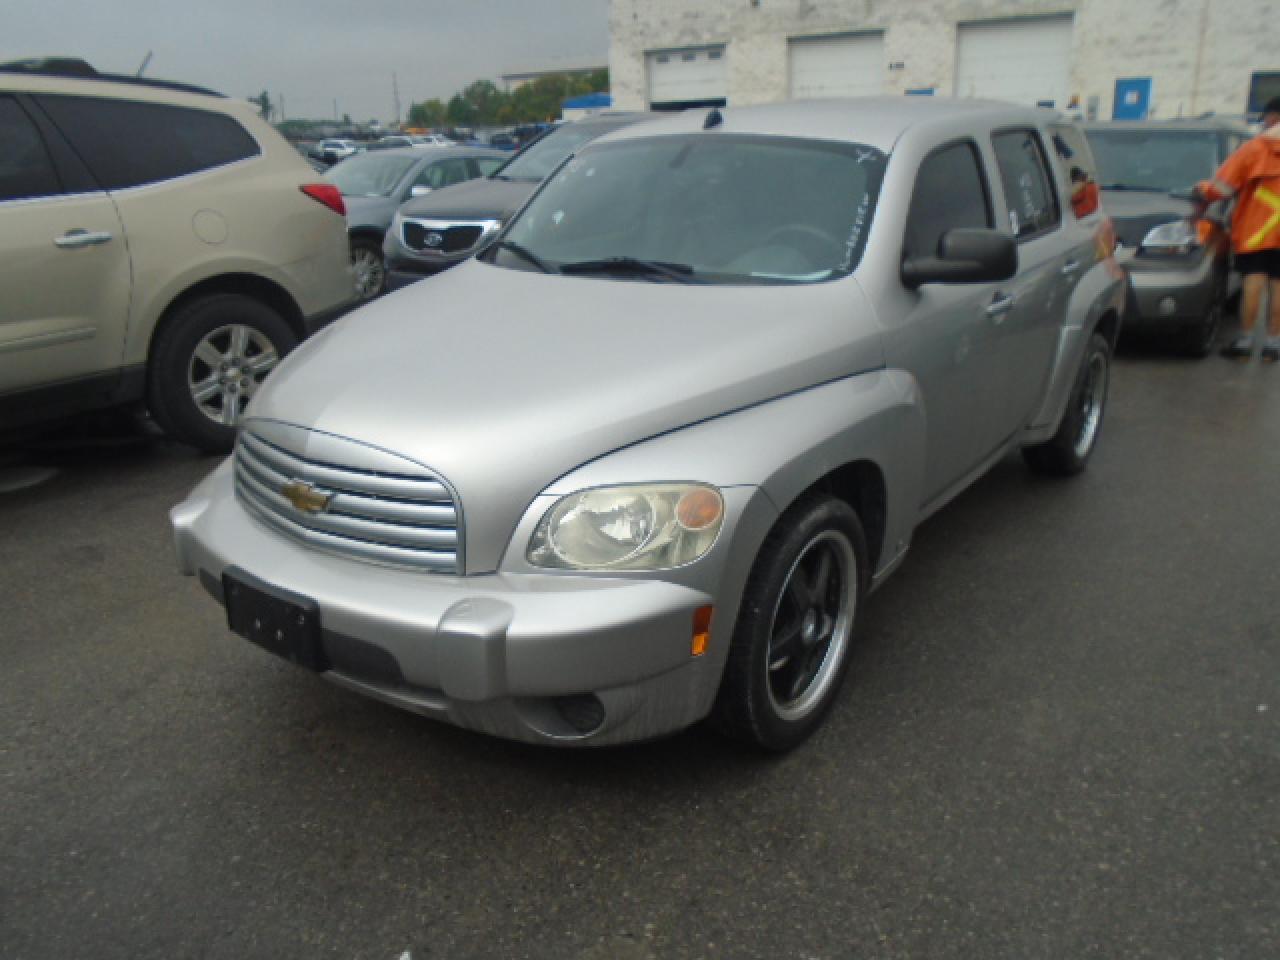 Photo of Silver 2006 Chevrolet HHR